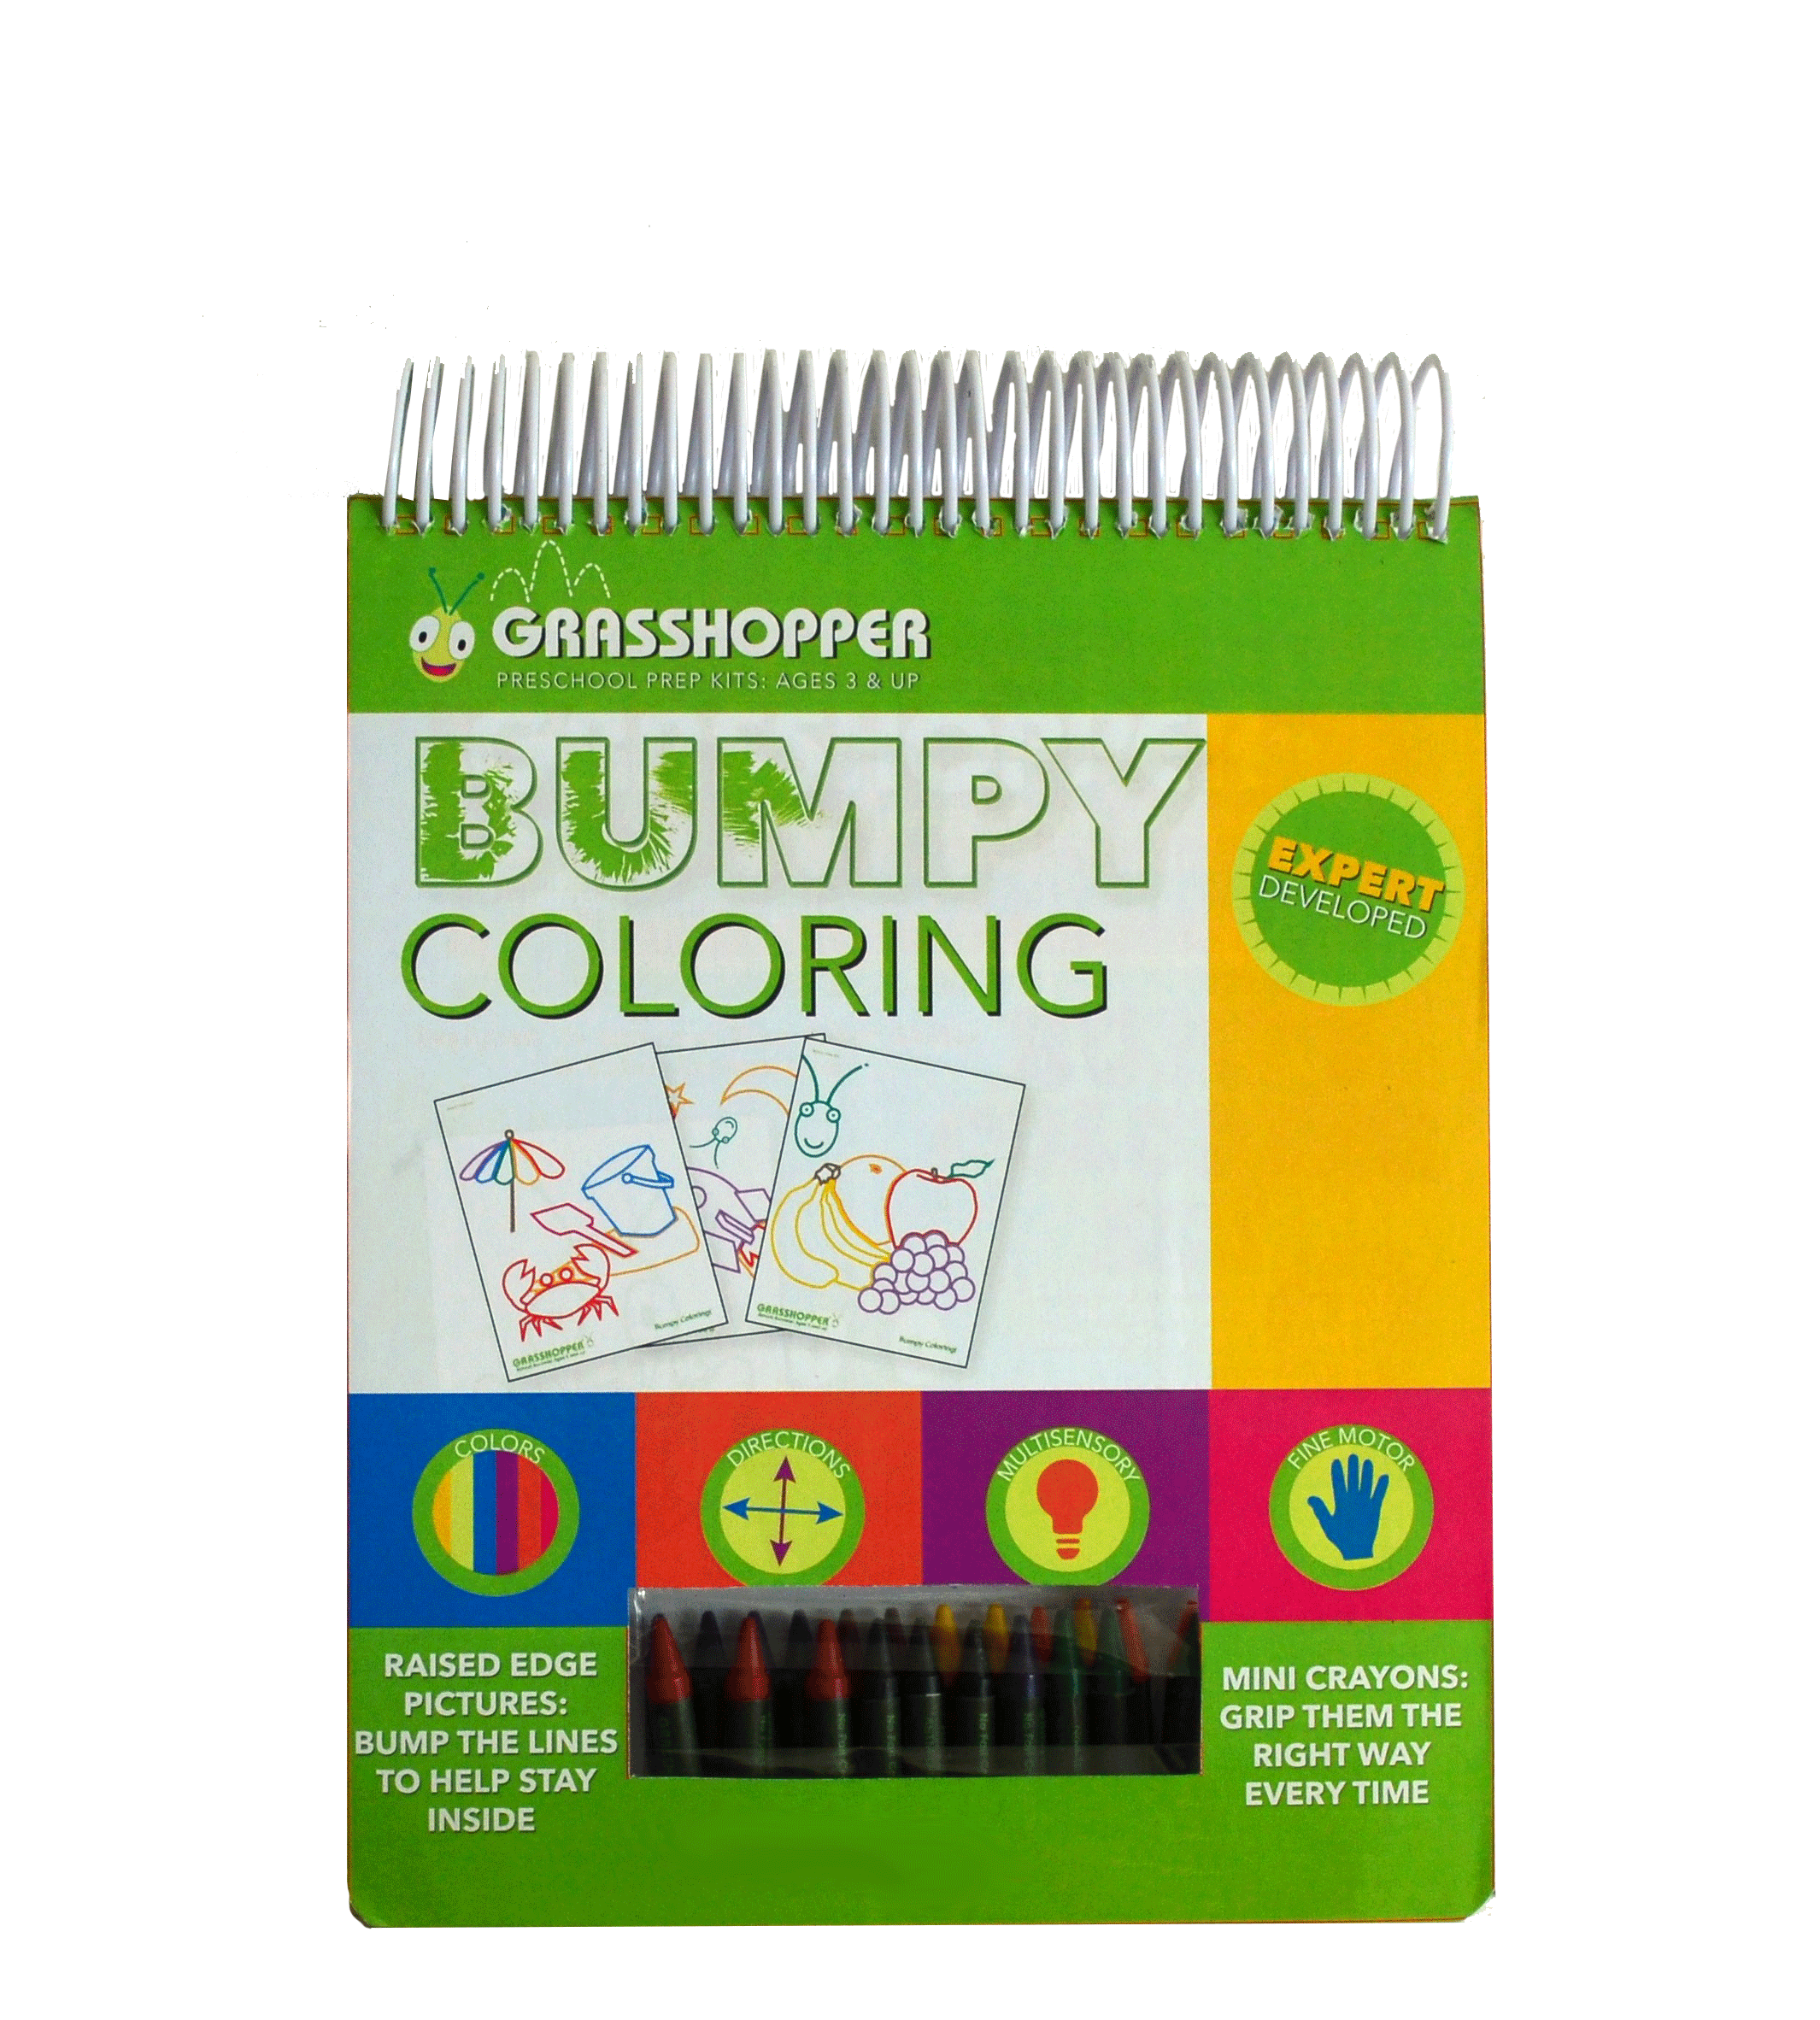 562507eb468ce6455493cbe9_bumpy-coloring.png